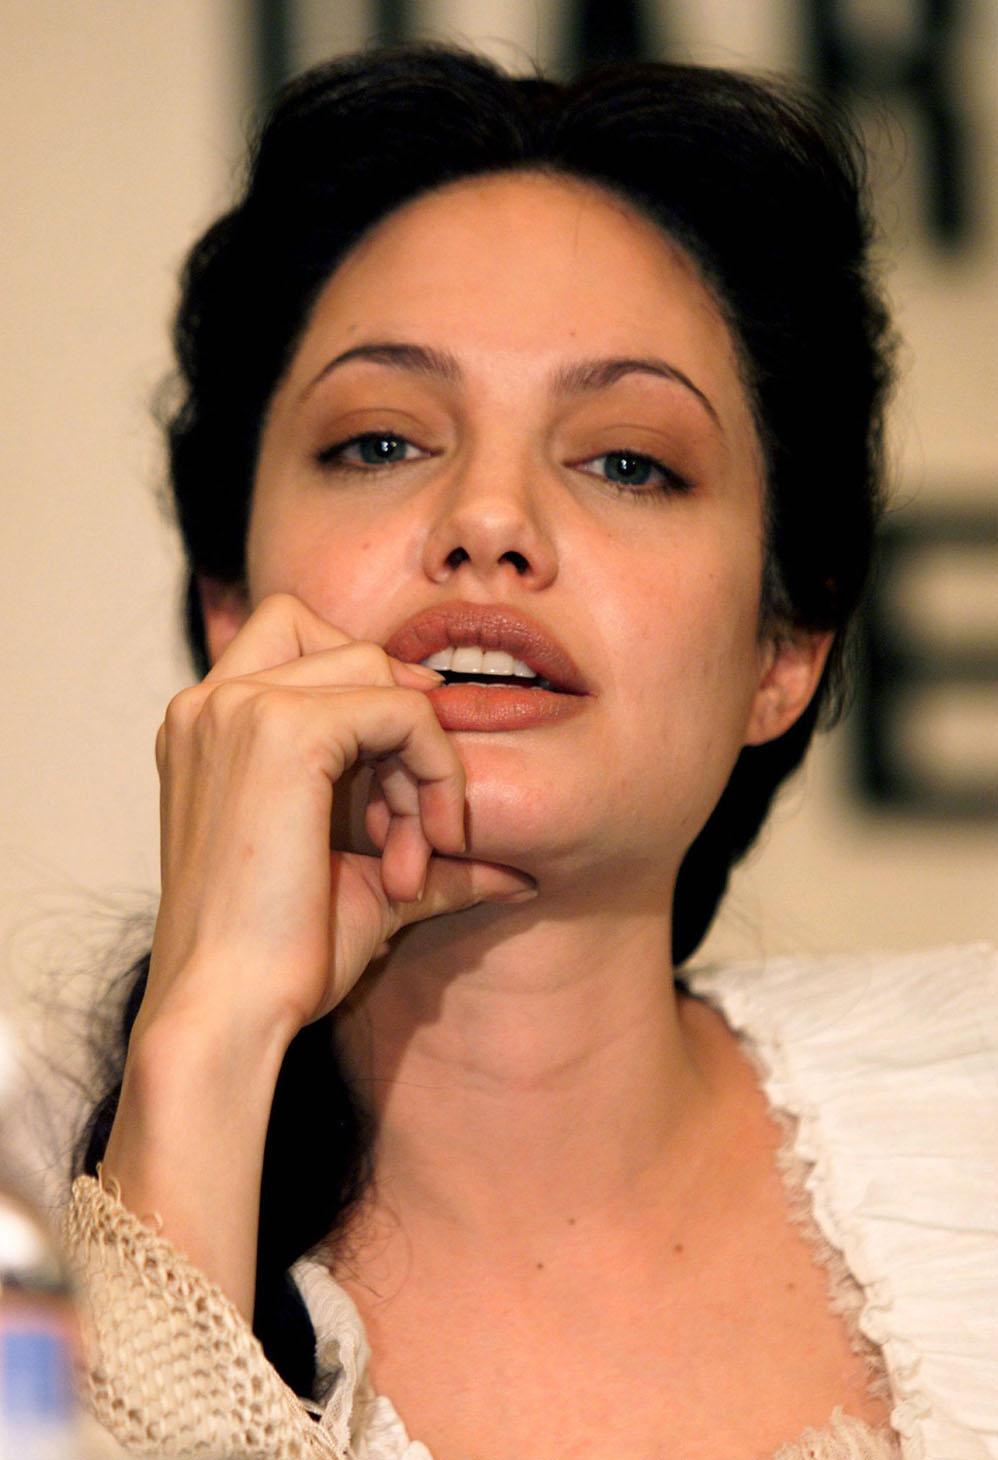 Angelina jolie salt wallpaper